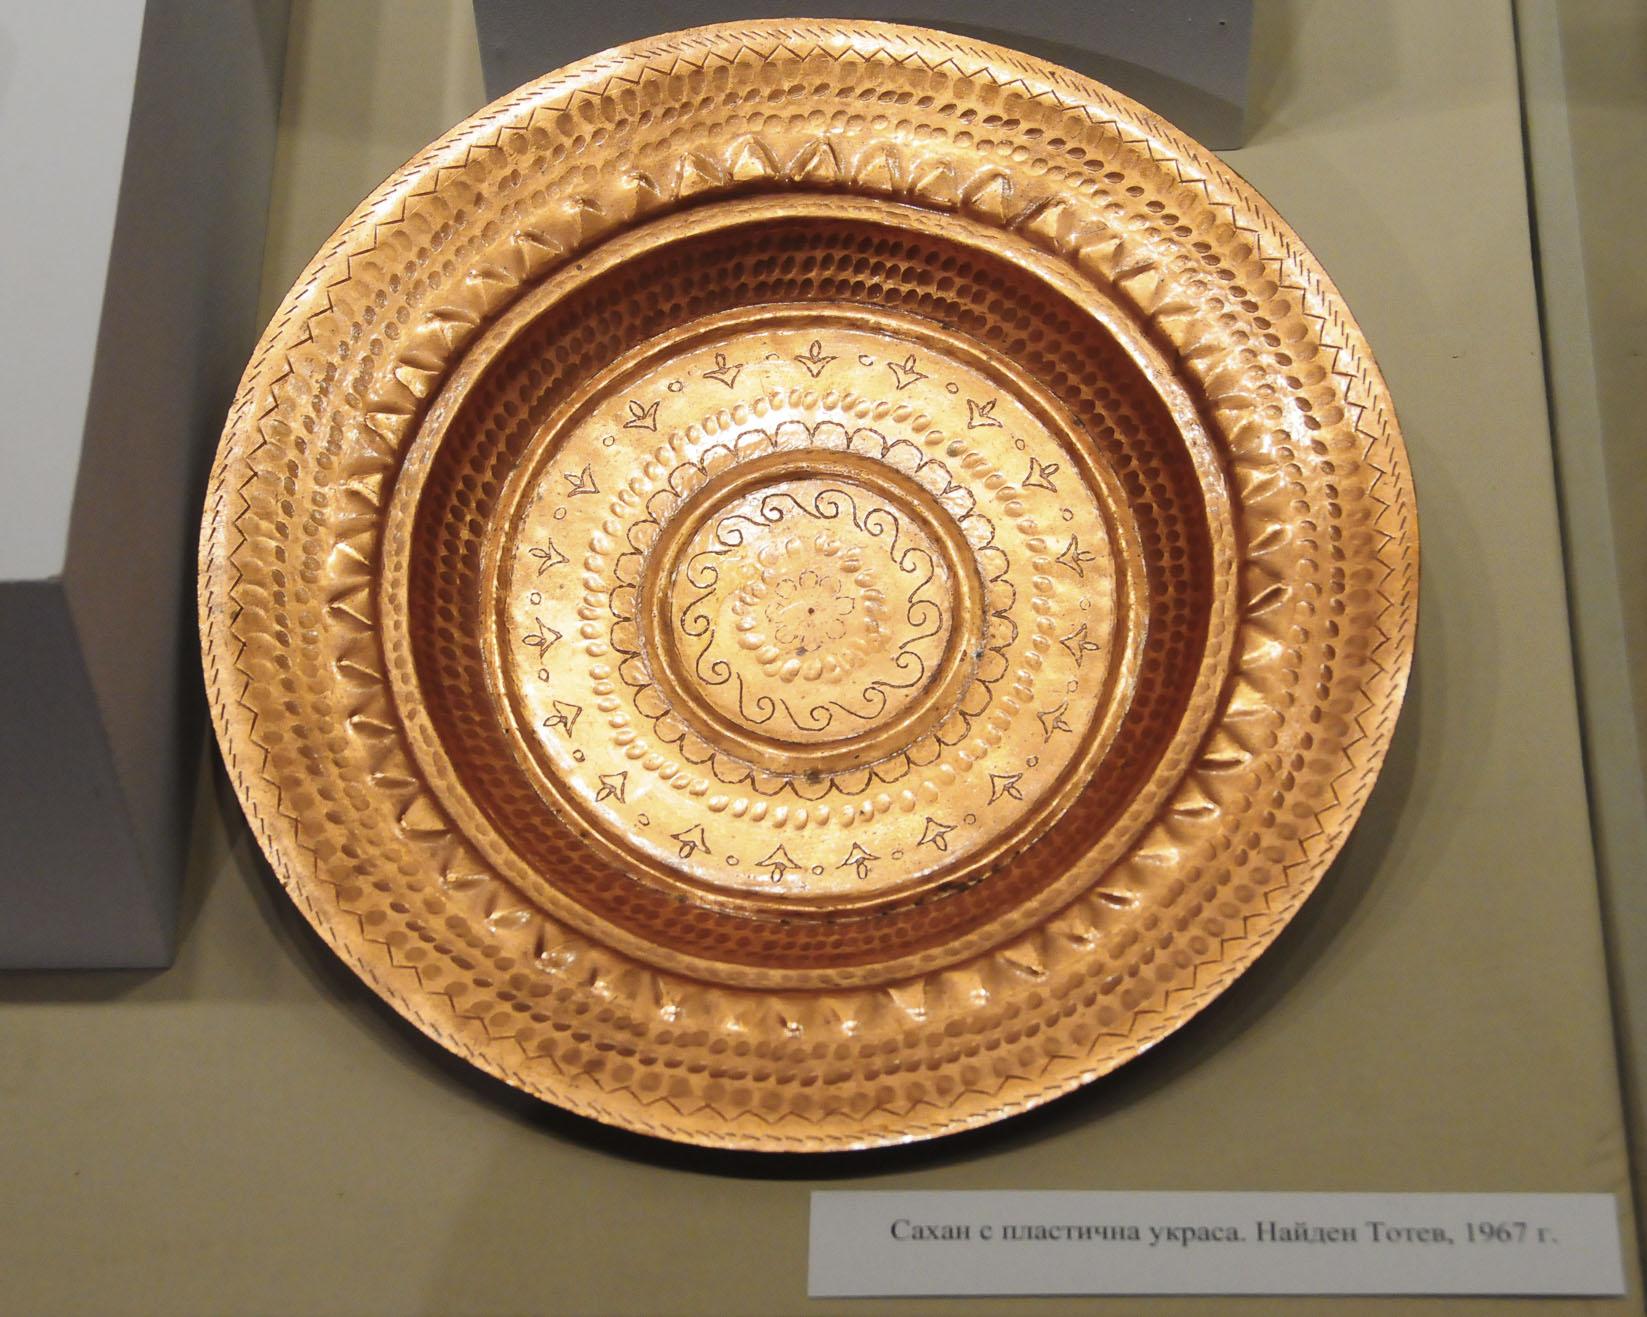 troyan-museum-mednikarstvo-ot-troyanskiq-krai-11